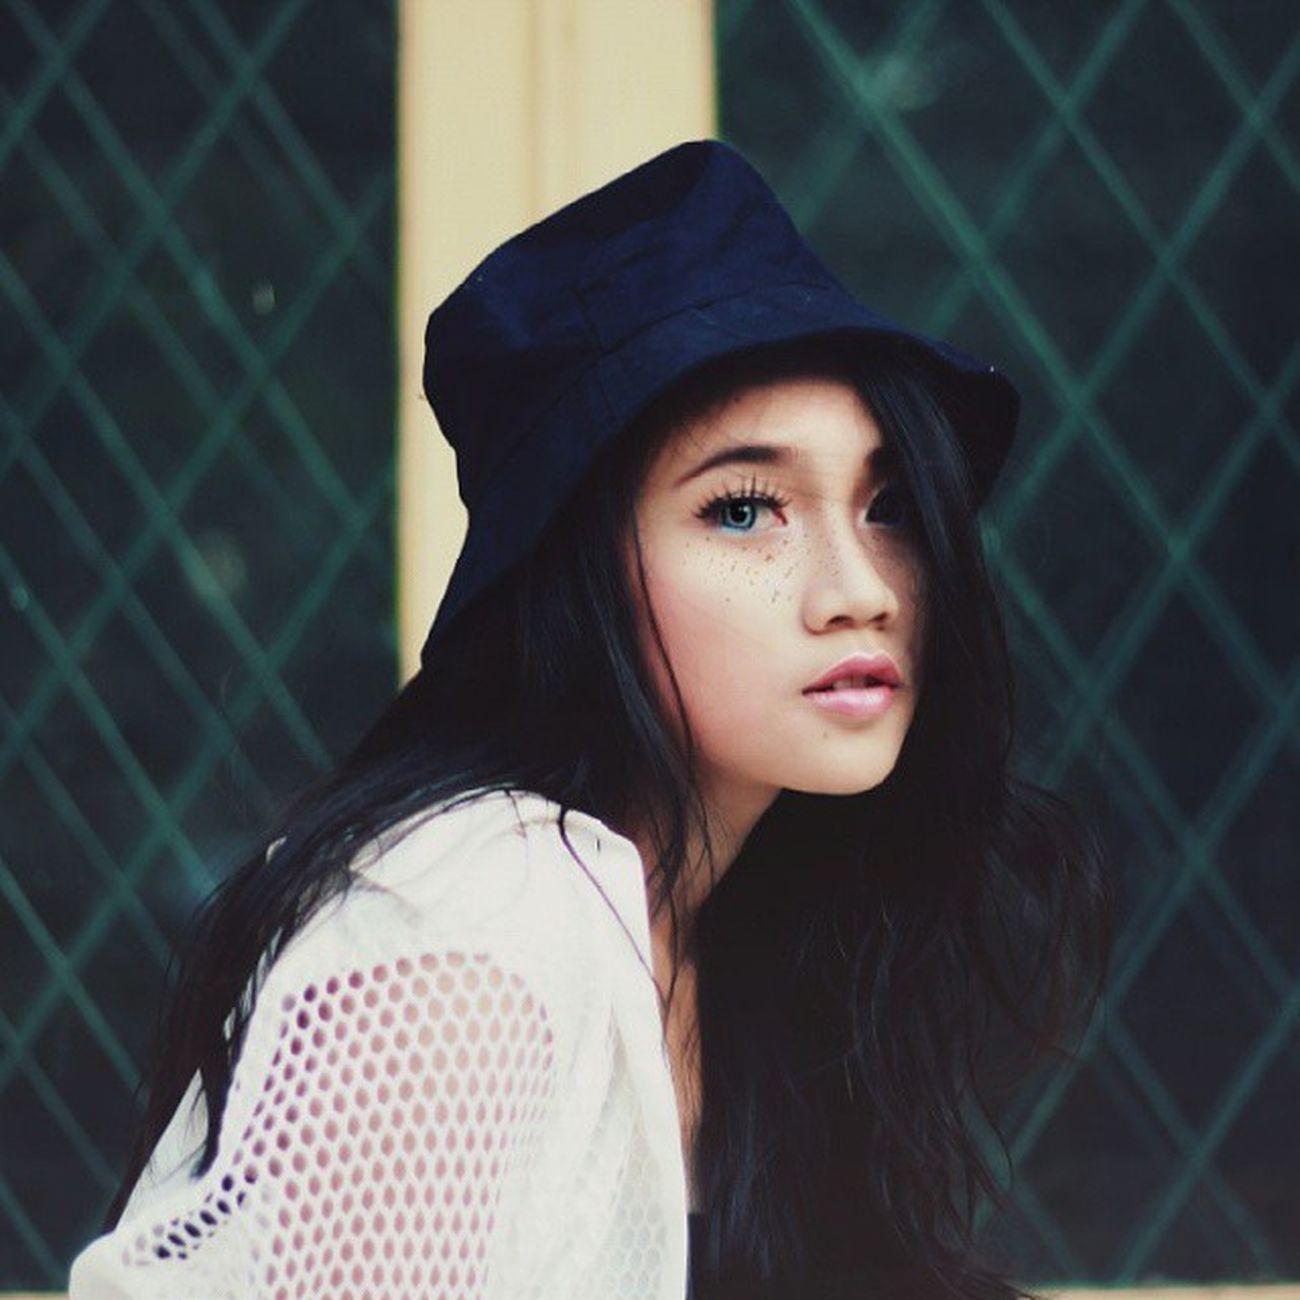 Model : @resha.destriani 2instagood 2instagoodportraitlove Ftwotww Ftwotw Rifqimlphoto Pixelphotography Portraits